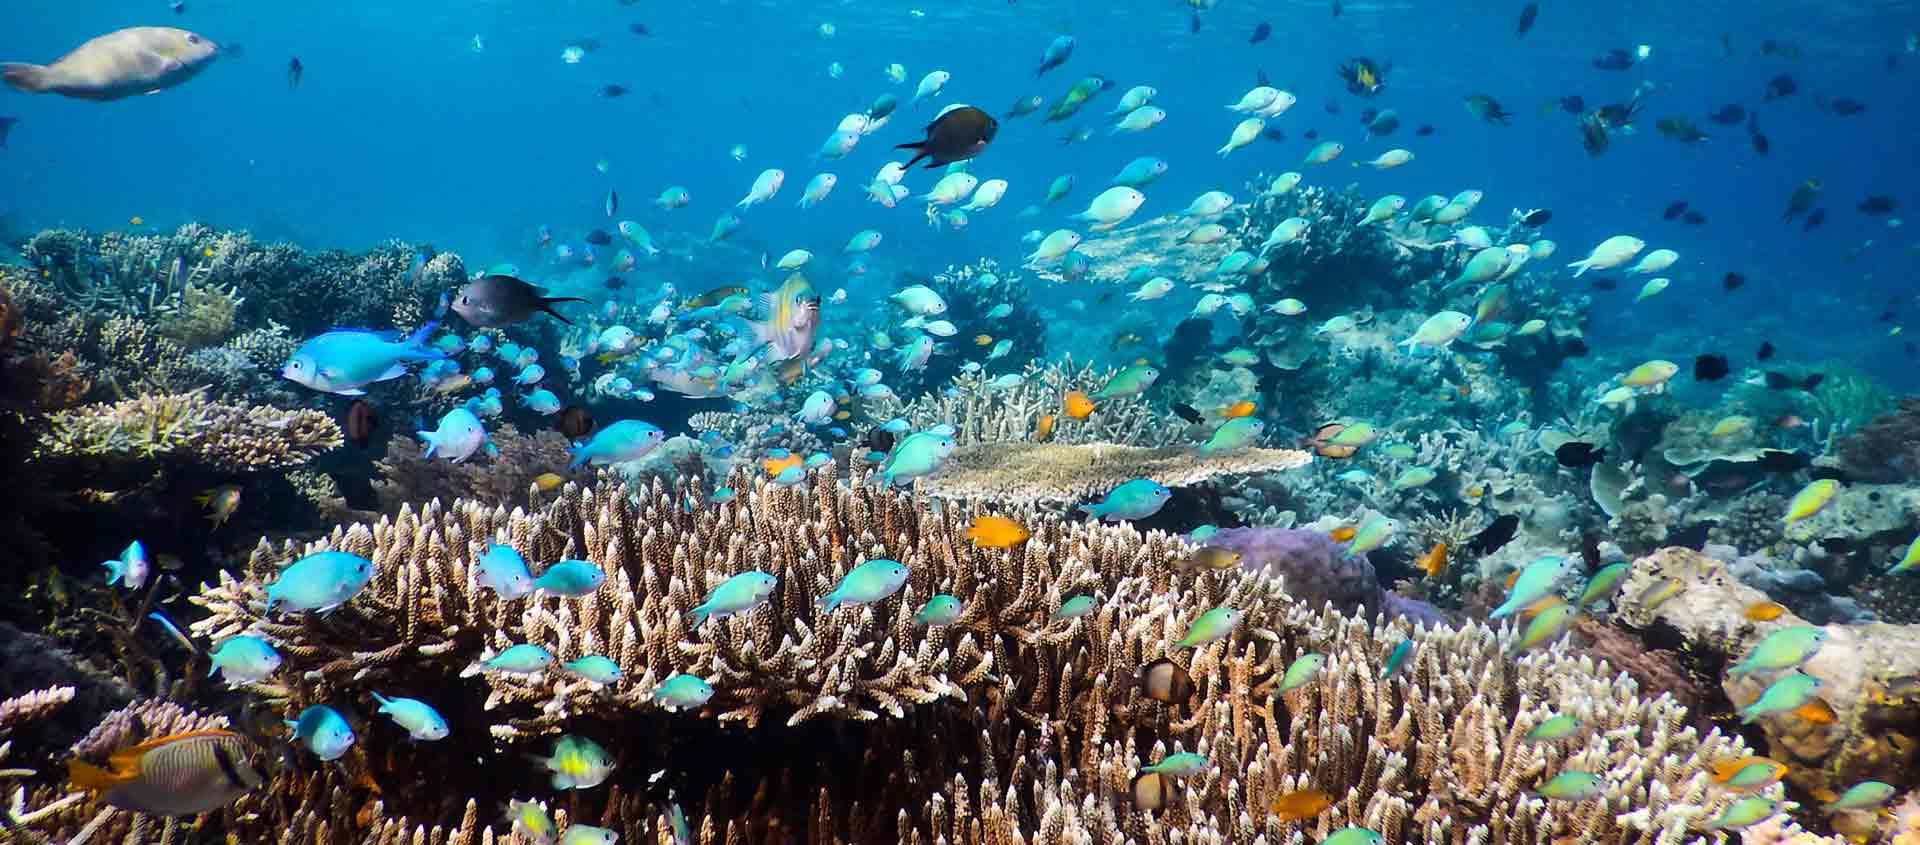 cruise australia west coast image of life on a reef